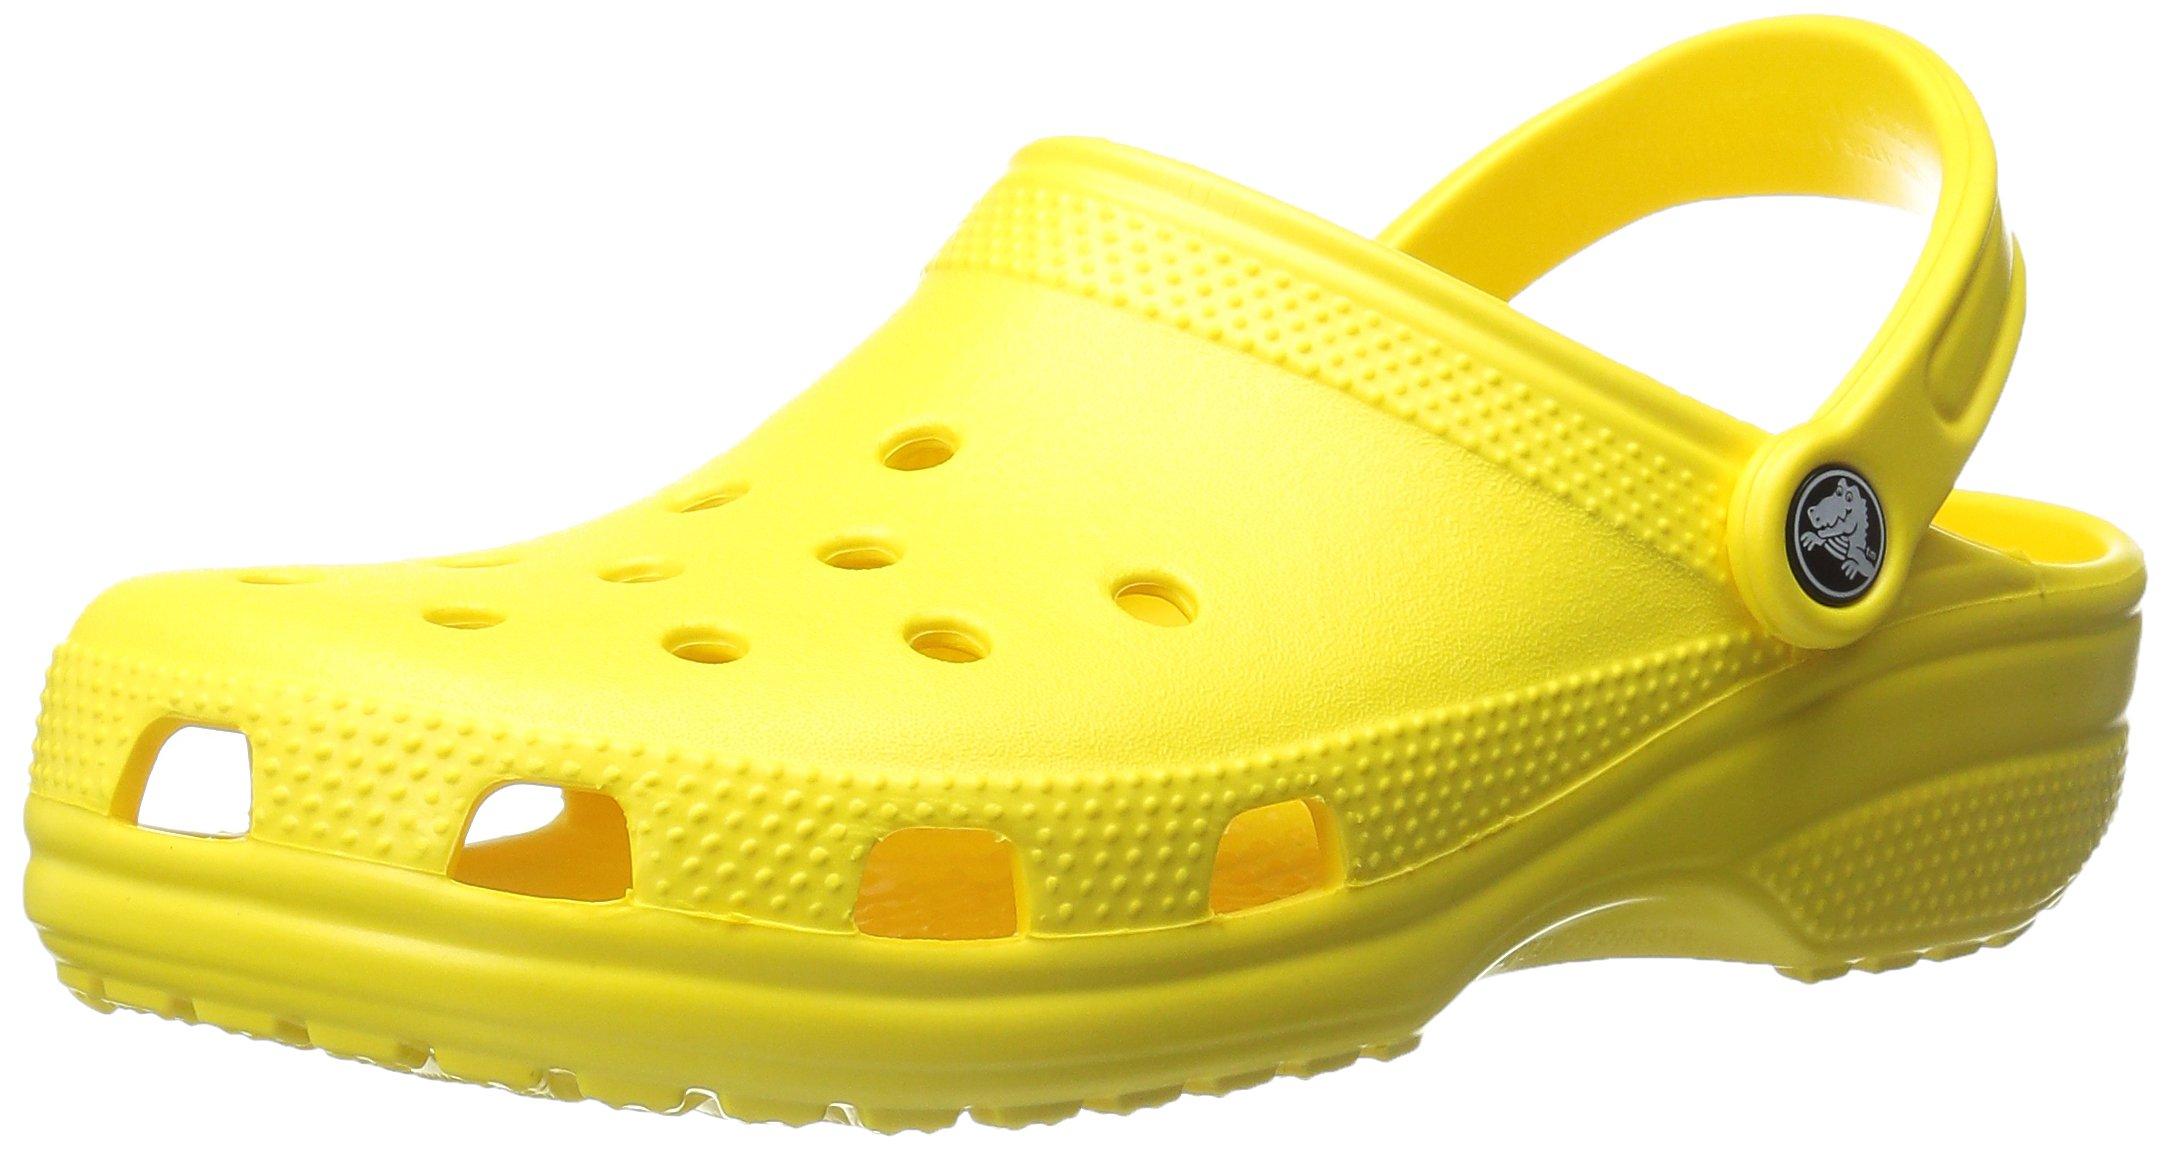 crocs Unisex Classic Clog,  Lemon, 7 US Men / 9 US Women